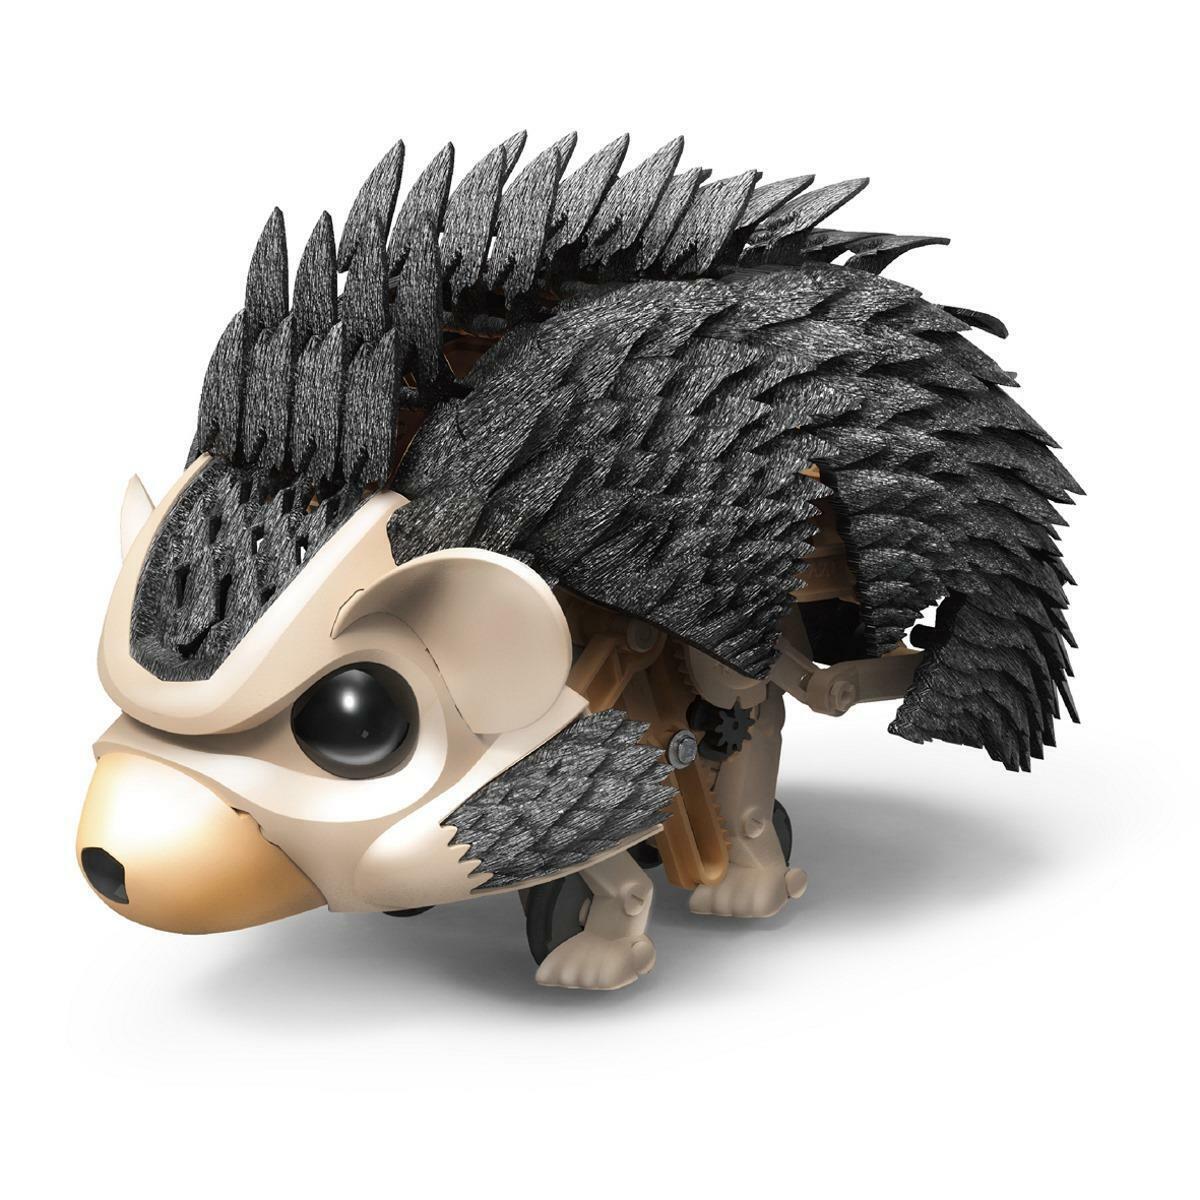 Robótico Hedgehog Ai Robot de Juguete Educativo Tallo LED Ojos Sonido Detección